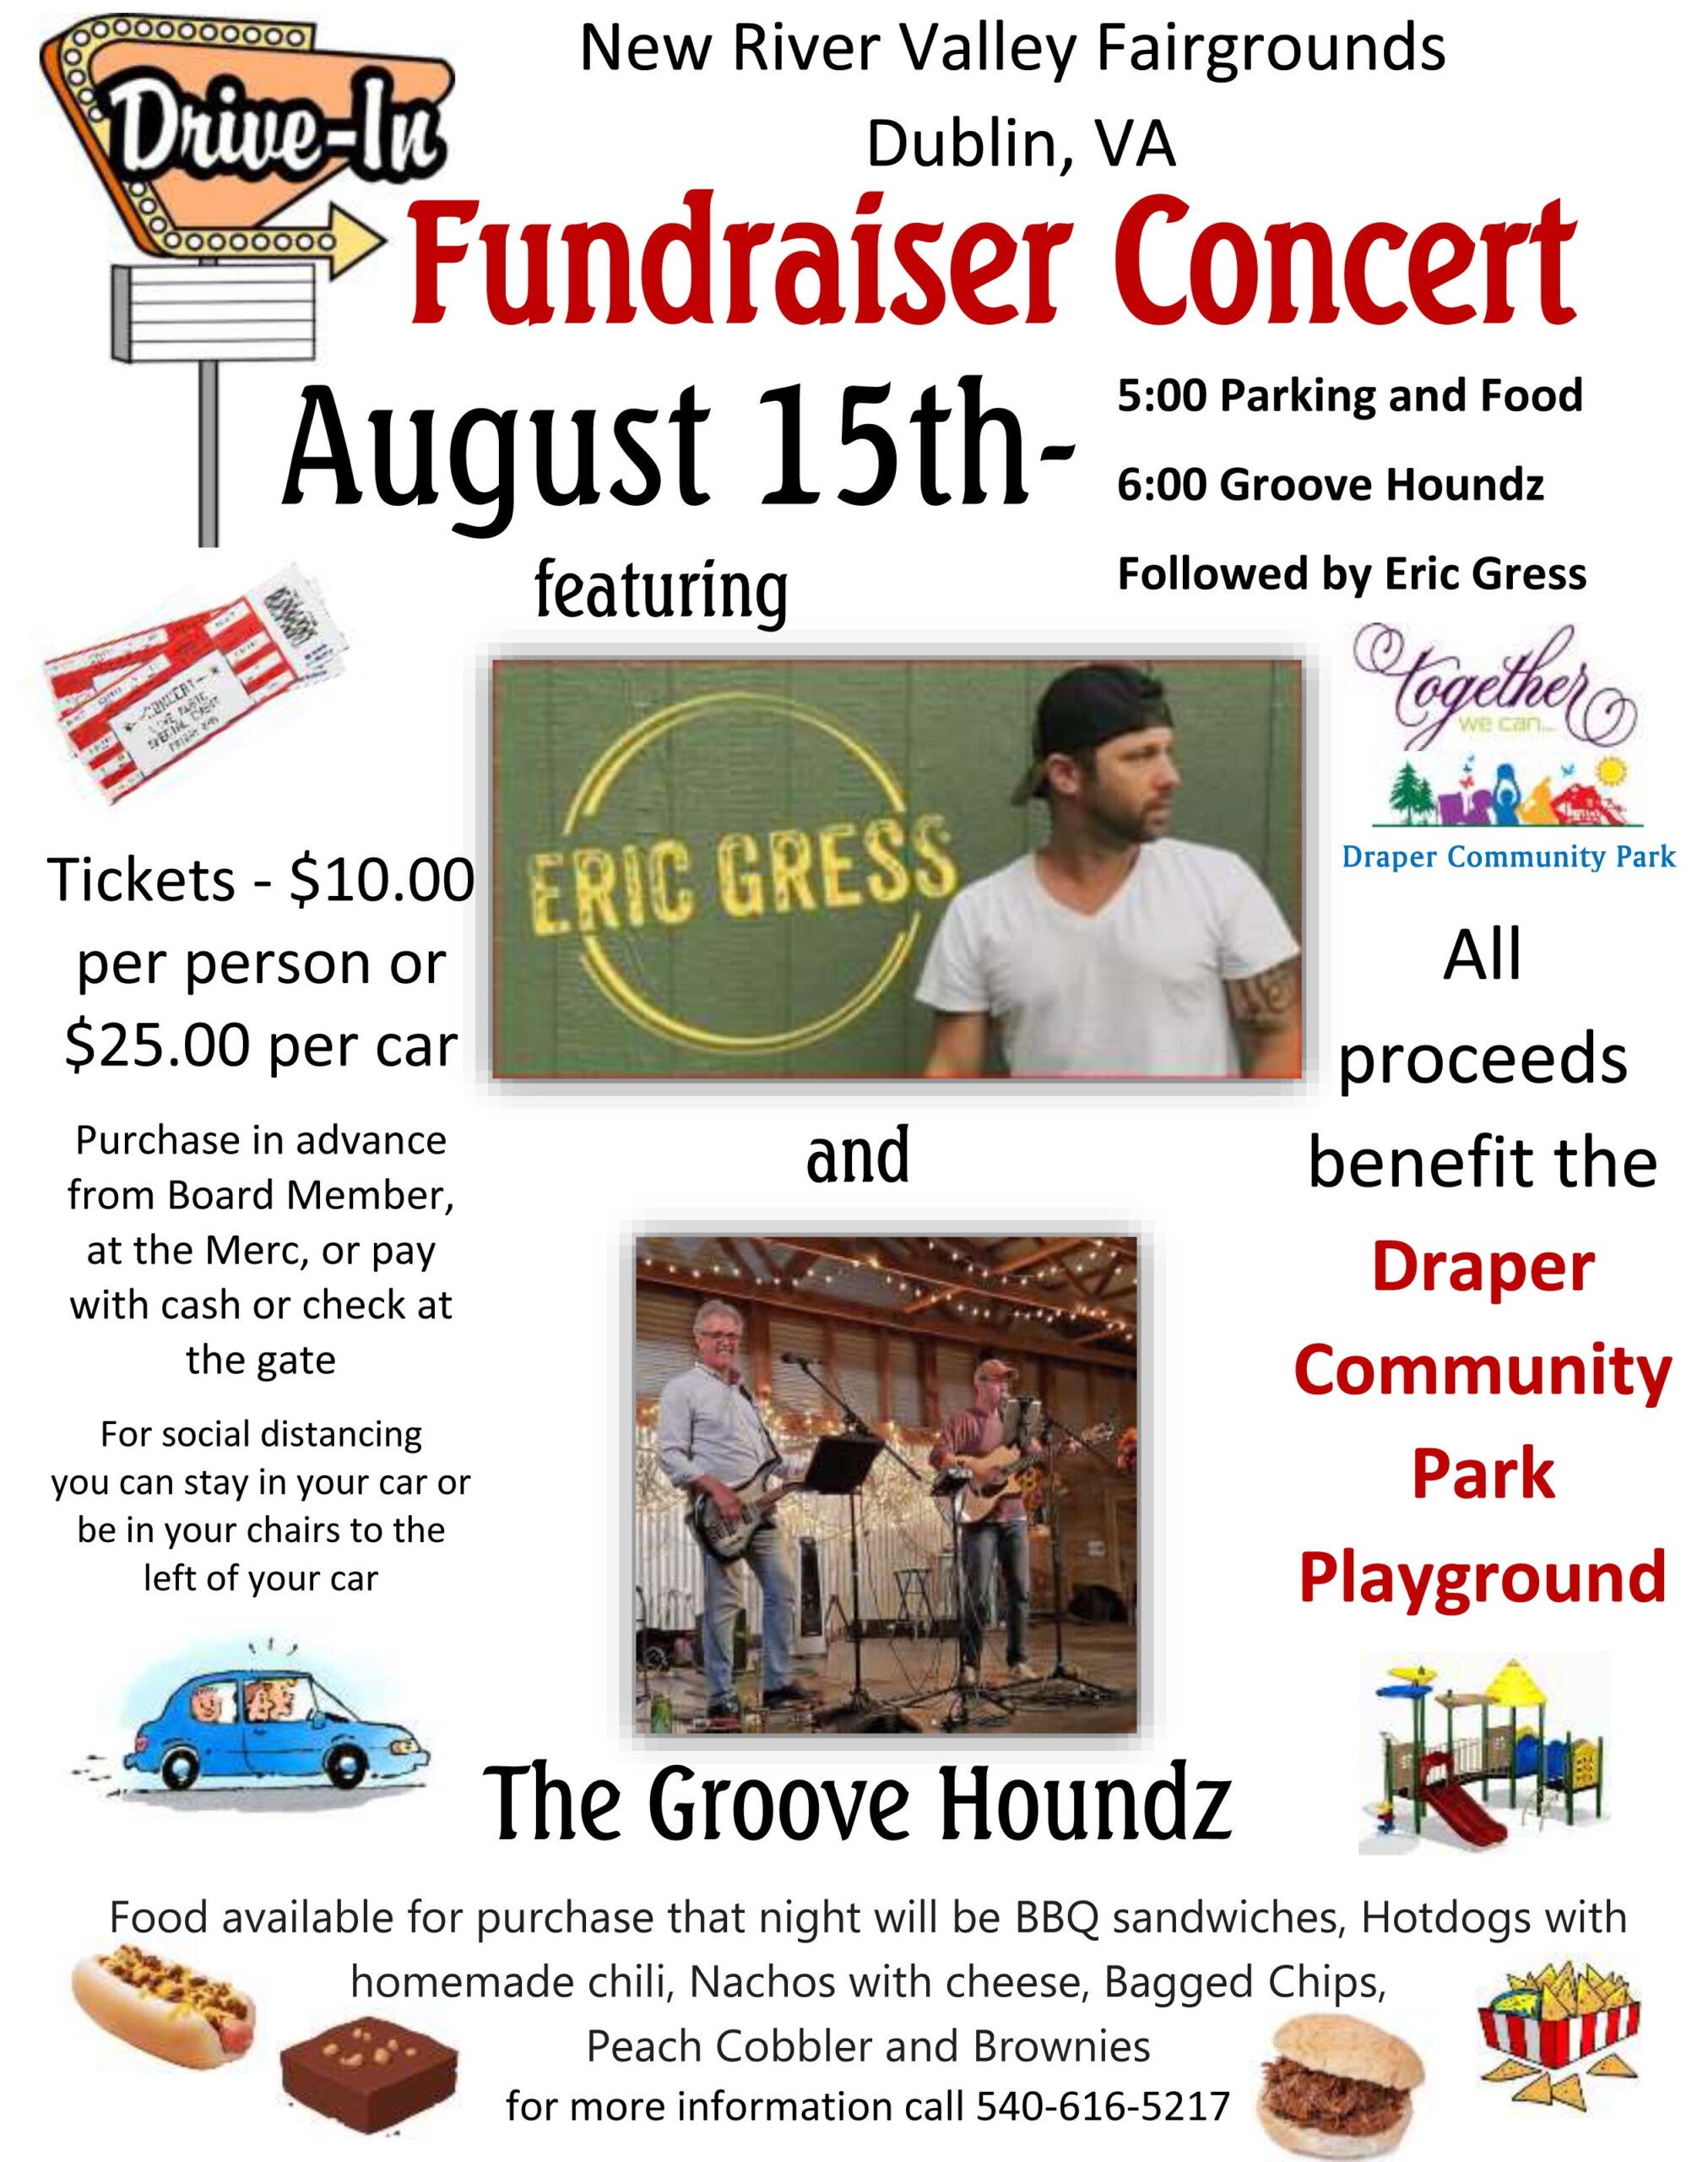 Draper Park fundraiser features Eric Gress